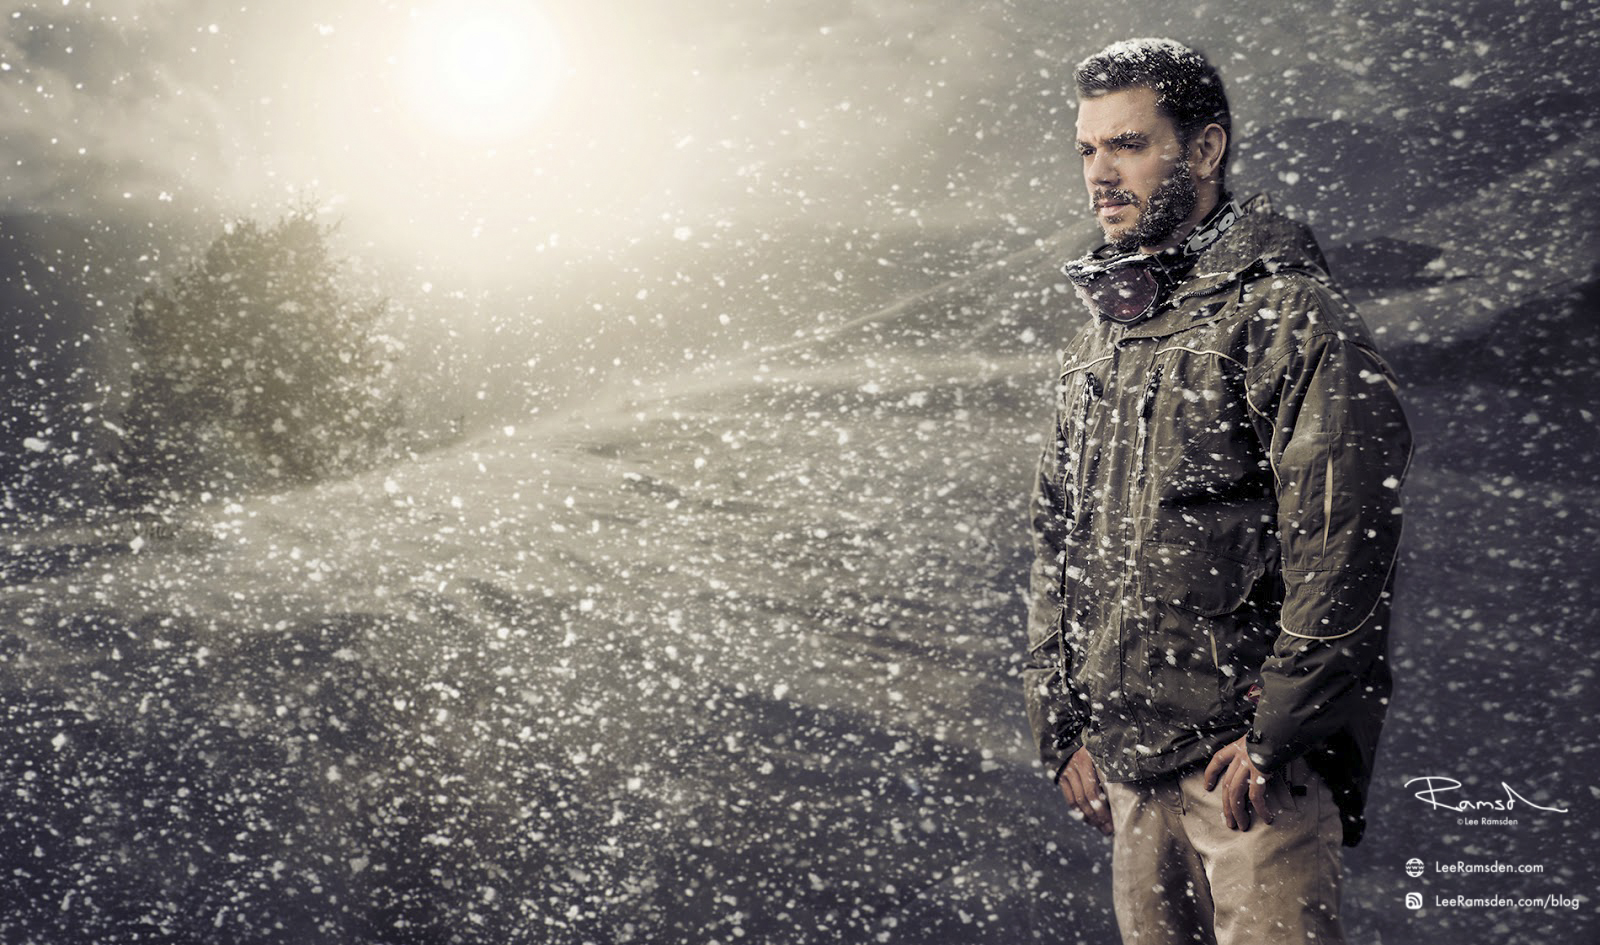 lee ramsden, snow, cold, photoshop, composite, ski, snow board, blizzard, professional, advertising, tree, sun, garden, snow machine, fake, frozen